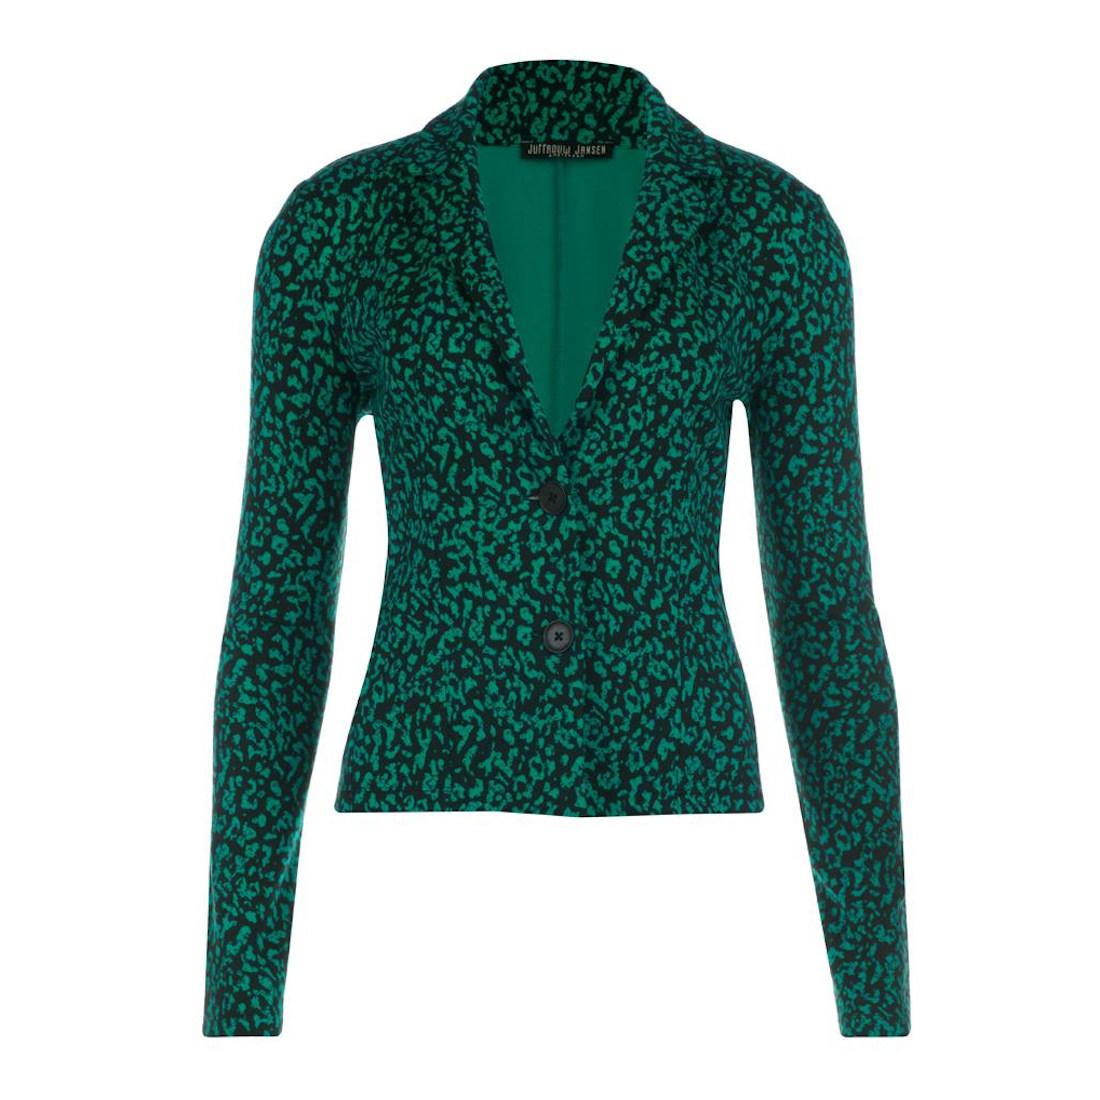 Smit Mode Juffrouw Jansen blazer amor w19 in het Groen